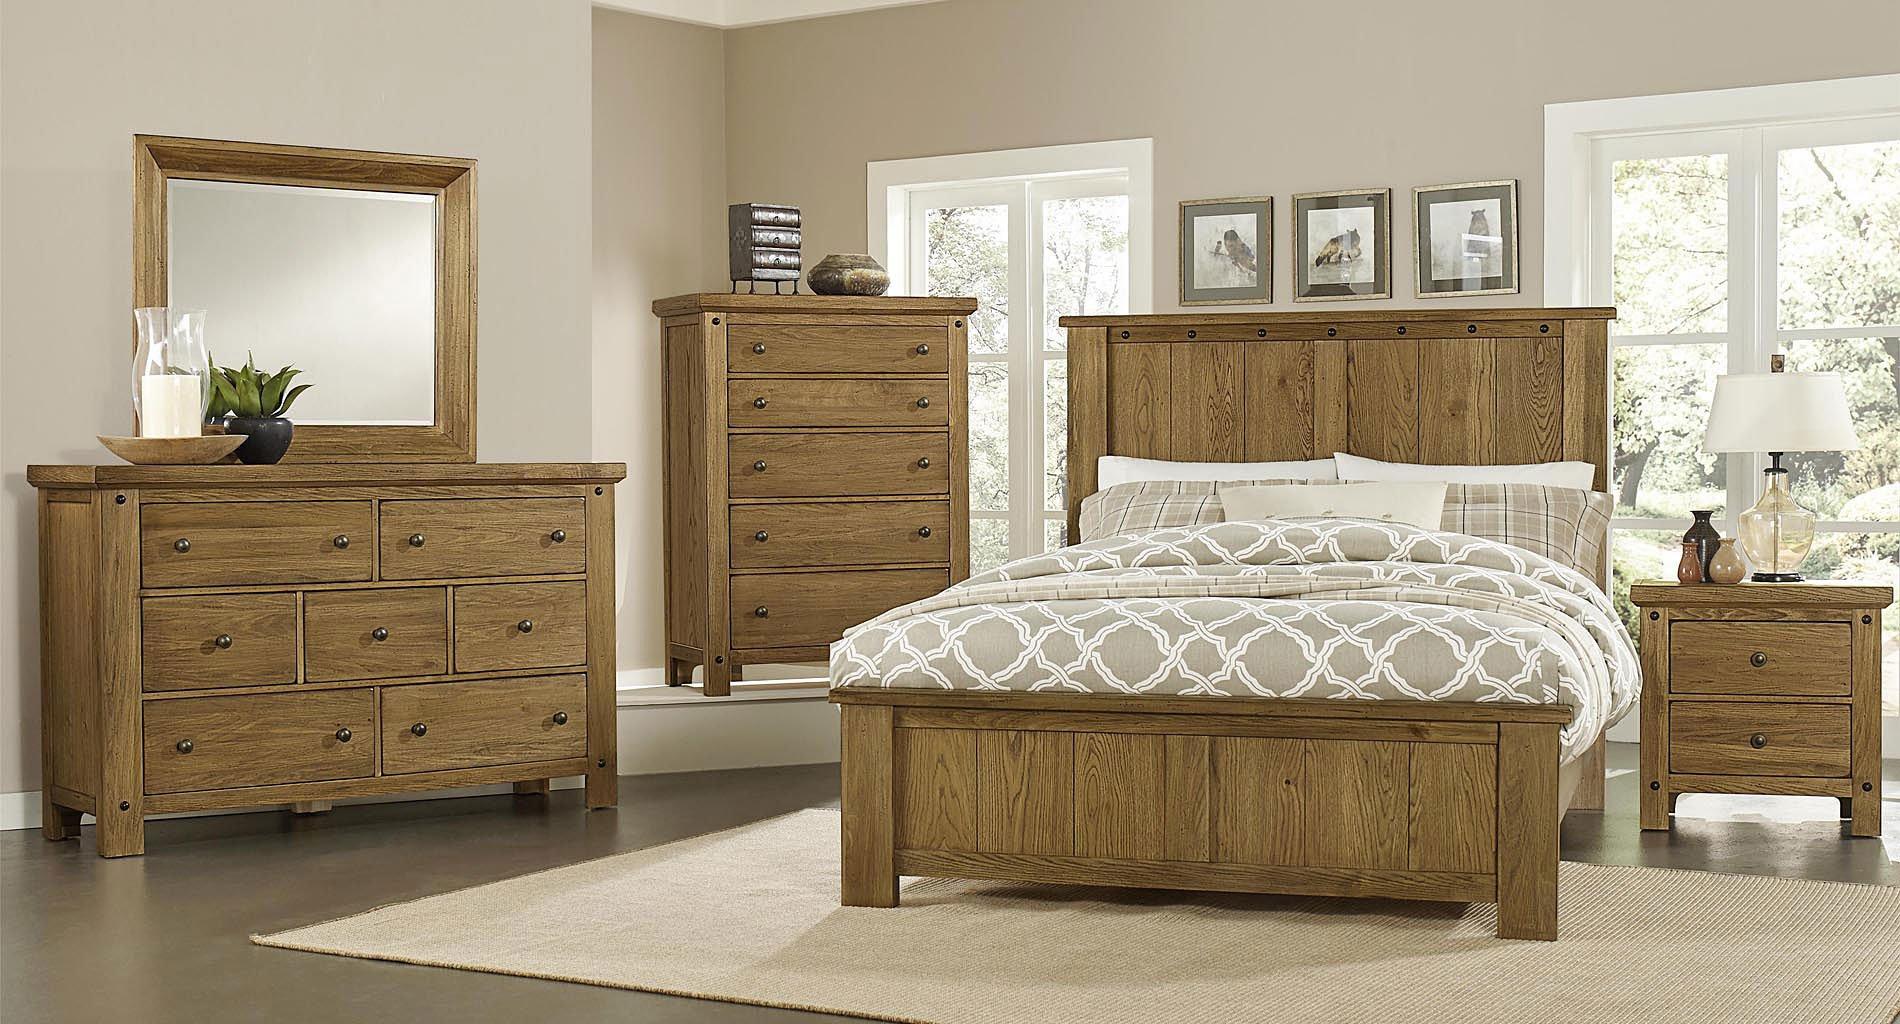 440 Bedroom Sets Oak Best